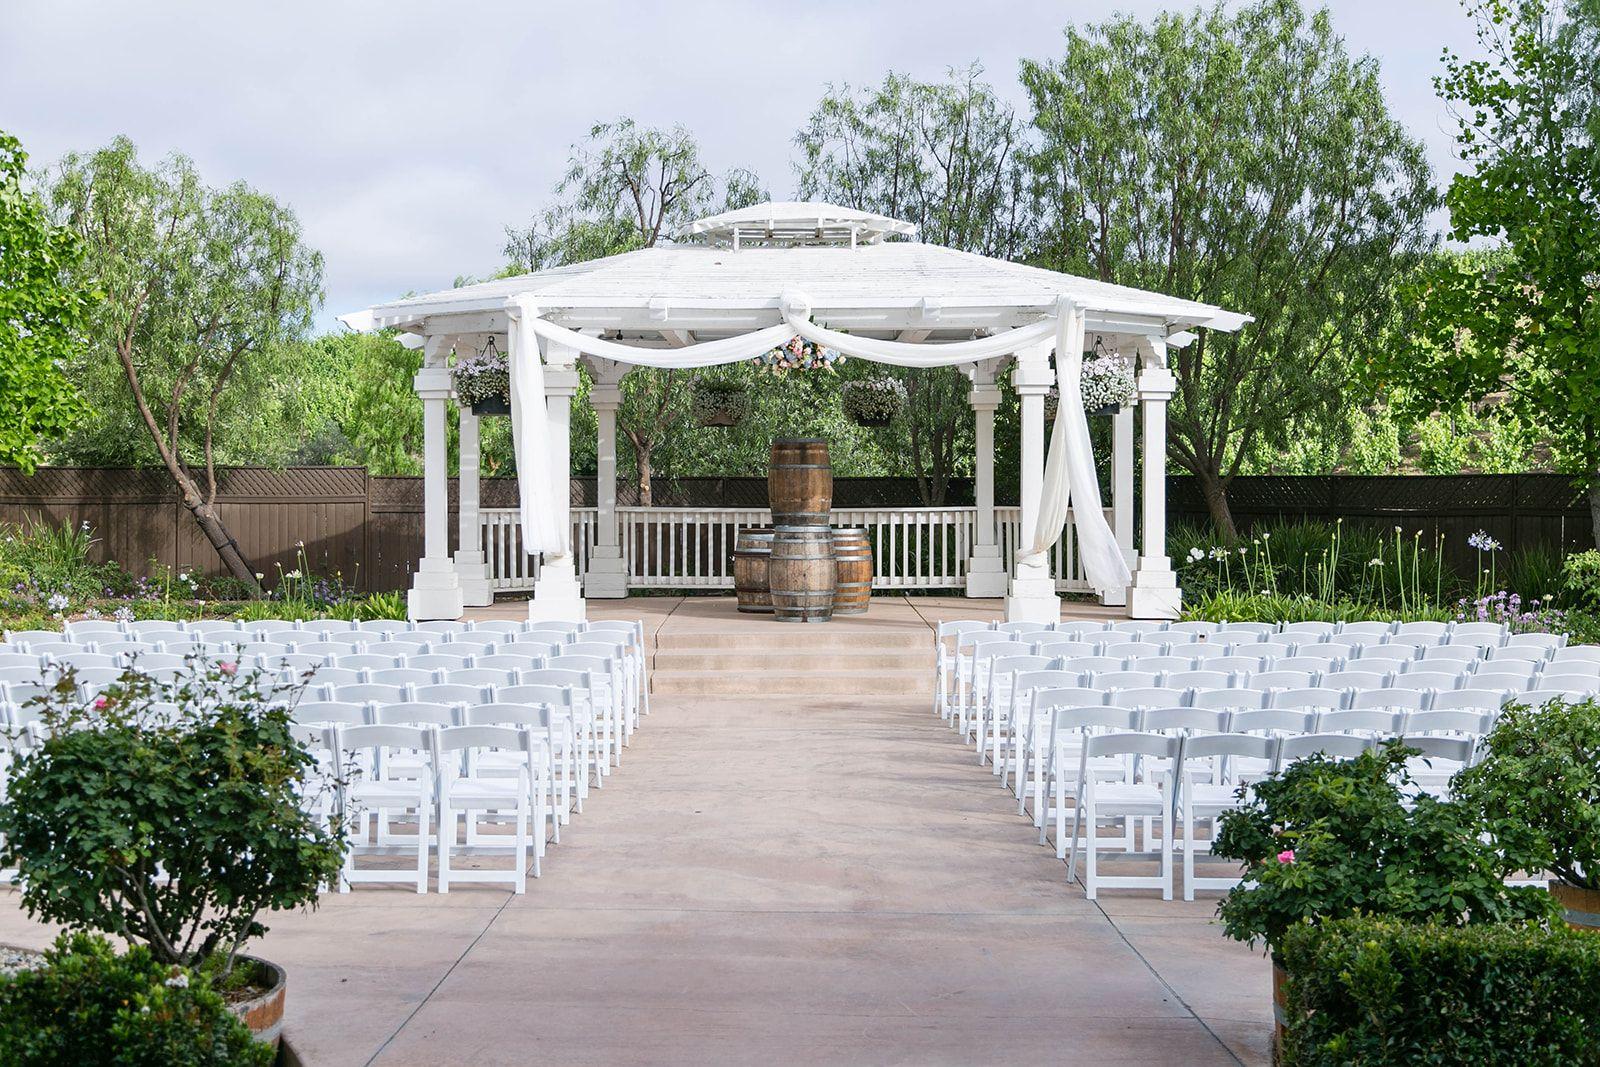 Ceremony Site Wilson Creek Winery Wedding Venue In Temecula Ca Leah Marie Photography Temecula Wineries Winery Wedding Venue Temecula Weddings